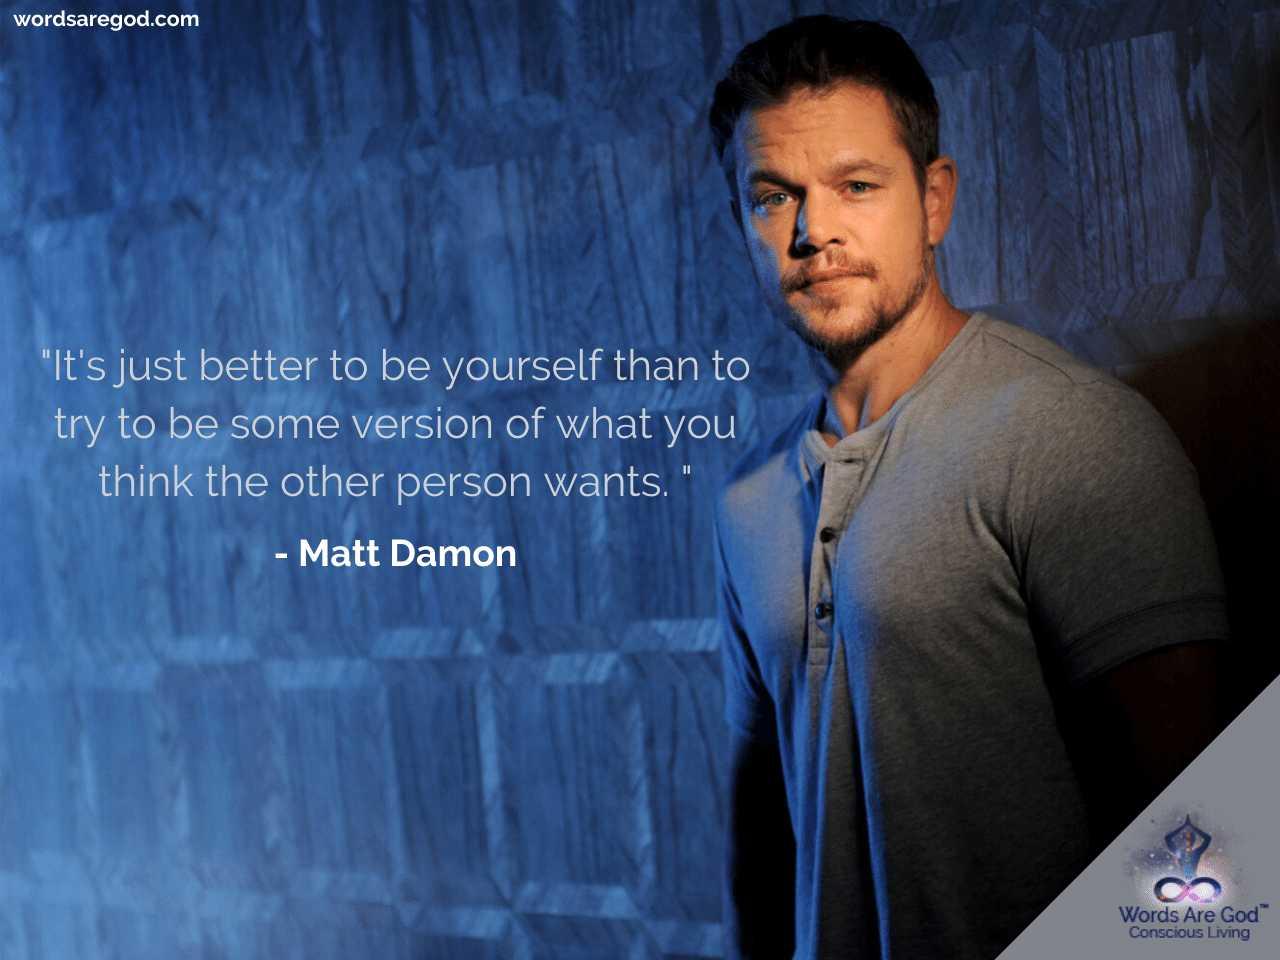 Matt Damon Best Quote by Matt Damon